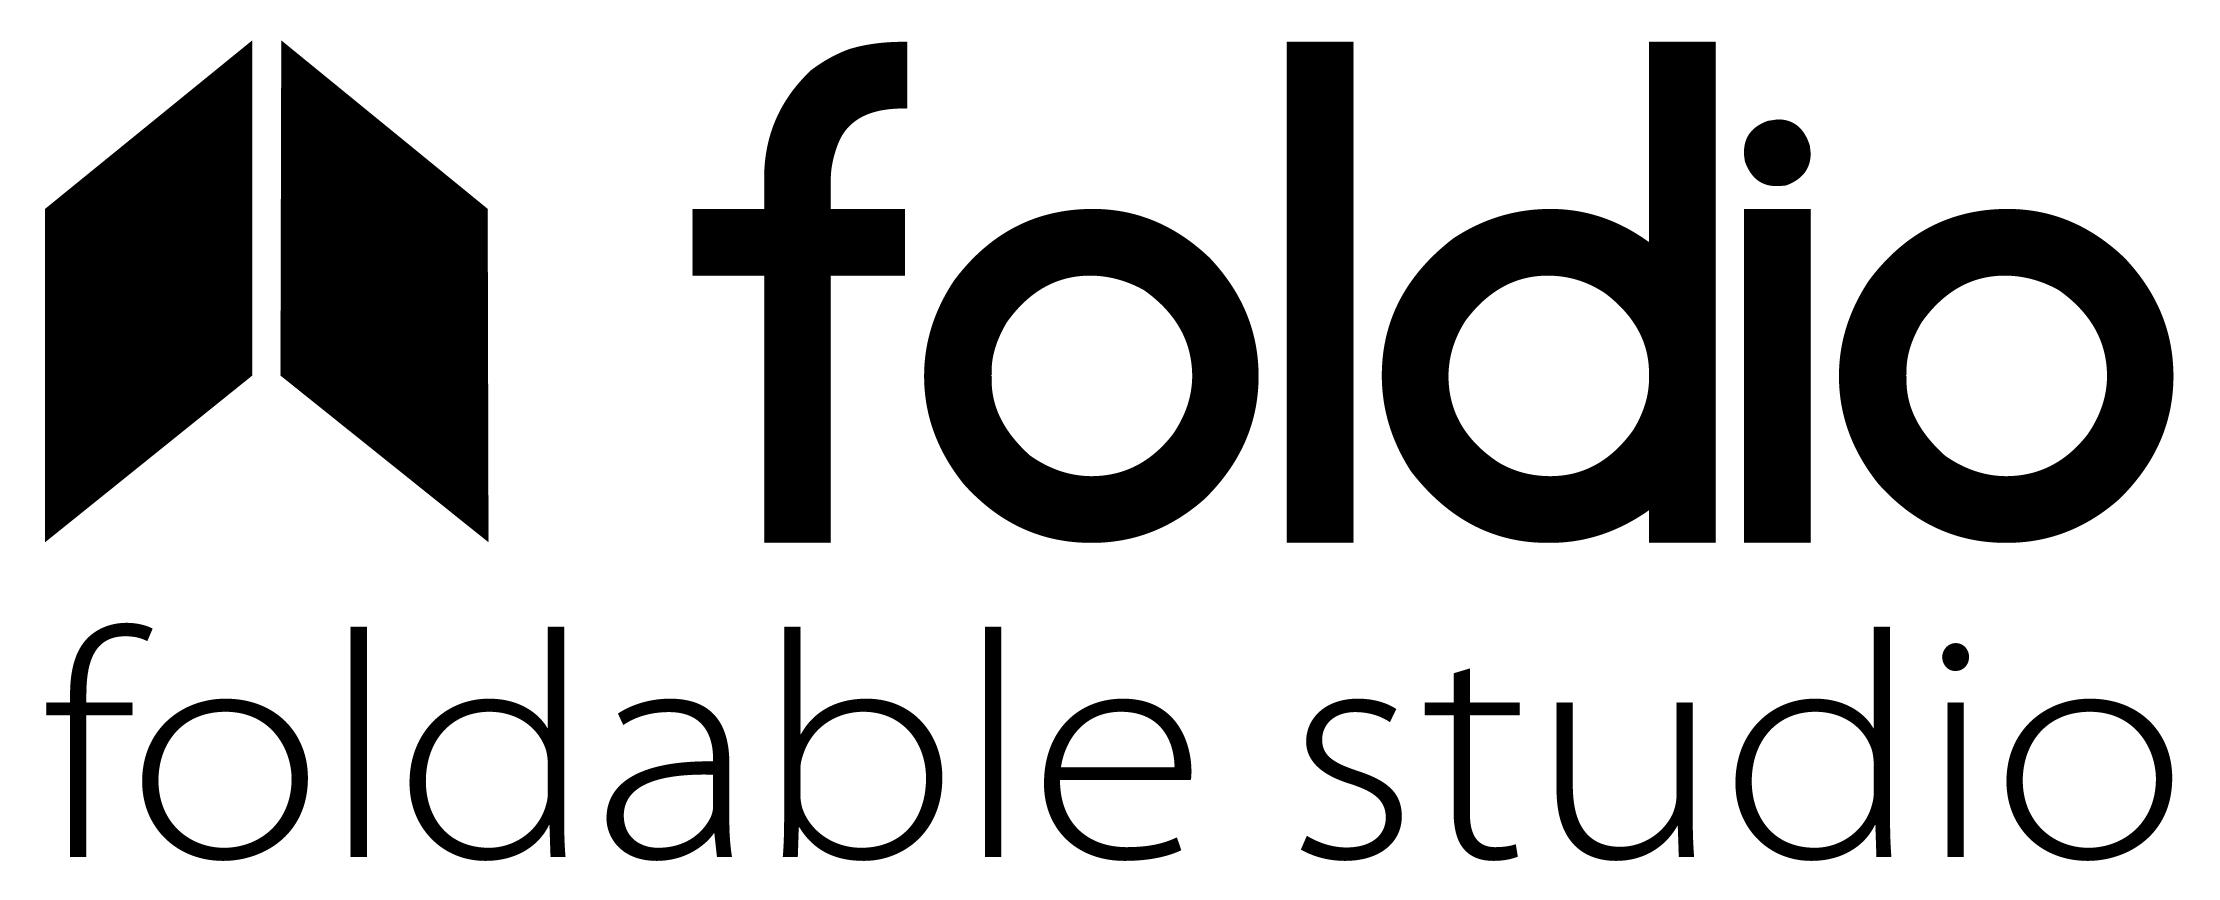 Foldio.hu